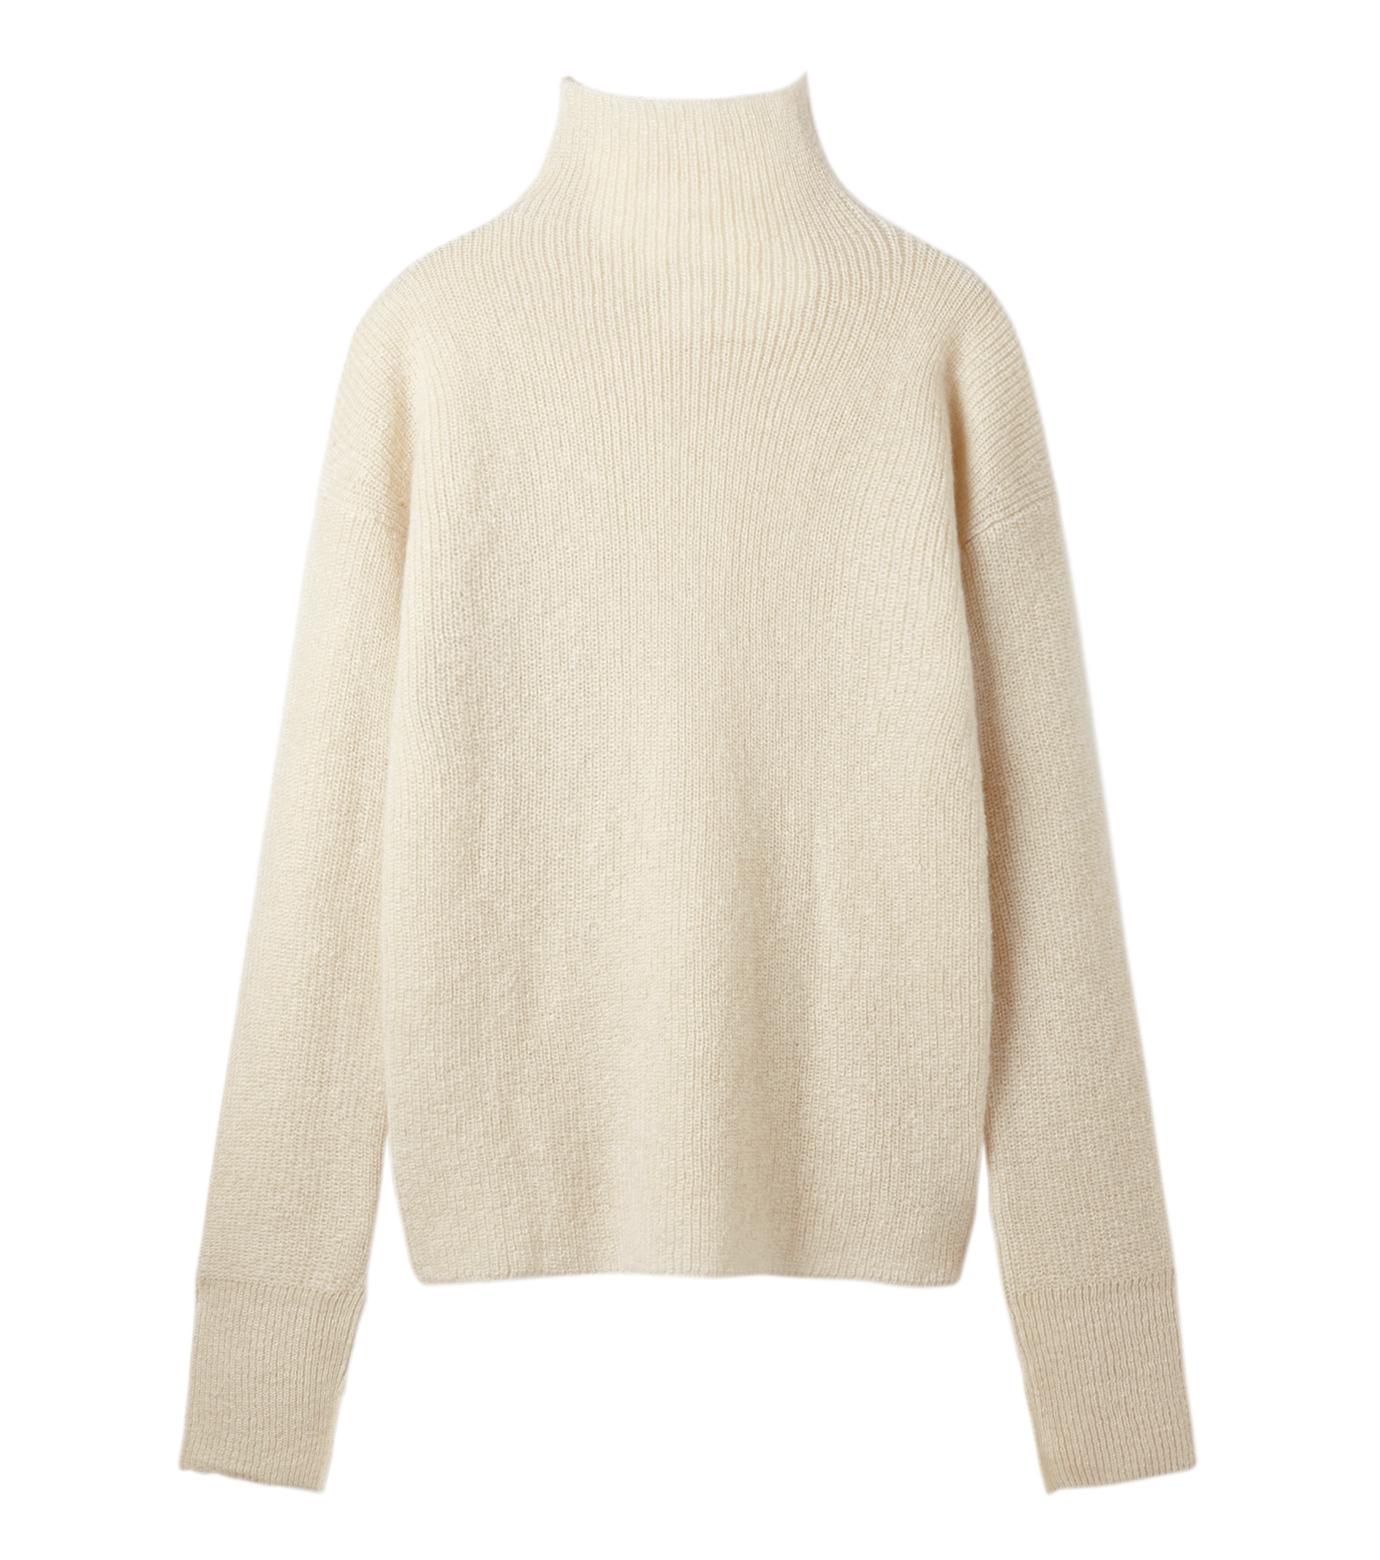 LE CIEL BLEU(ルシェルブルー)のシルクモヘヤニットトップス-WHITE(ニット/knit)-18A61528 拡大詳細画像5